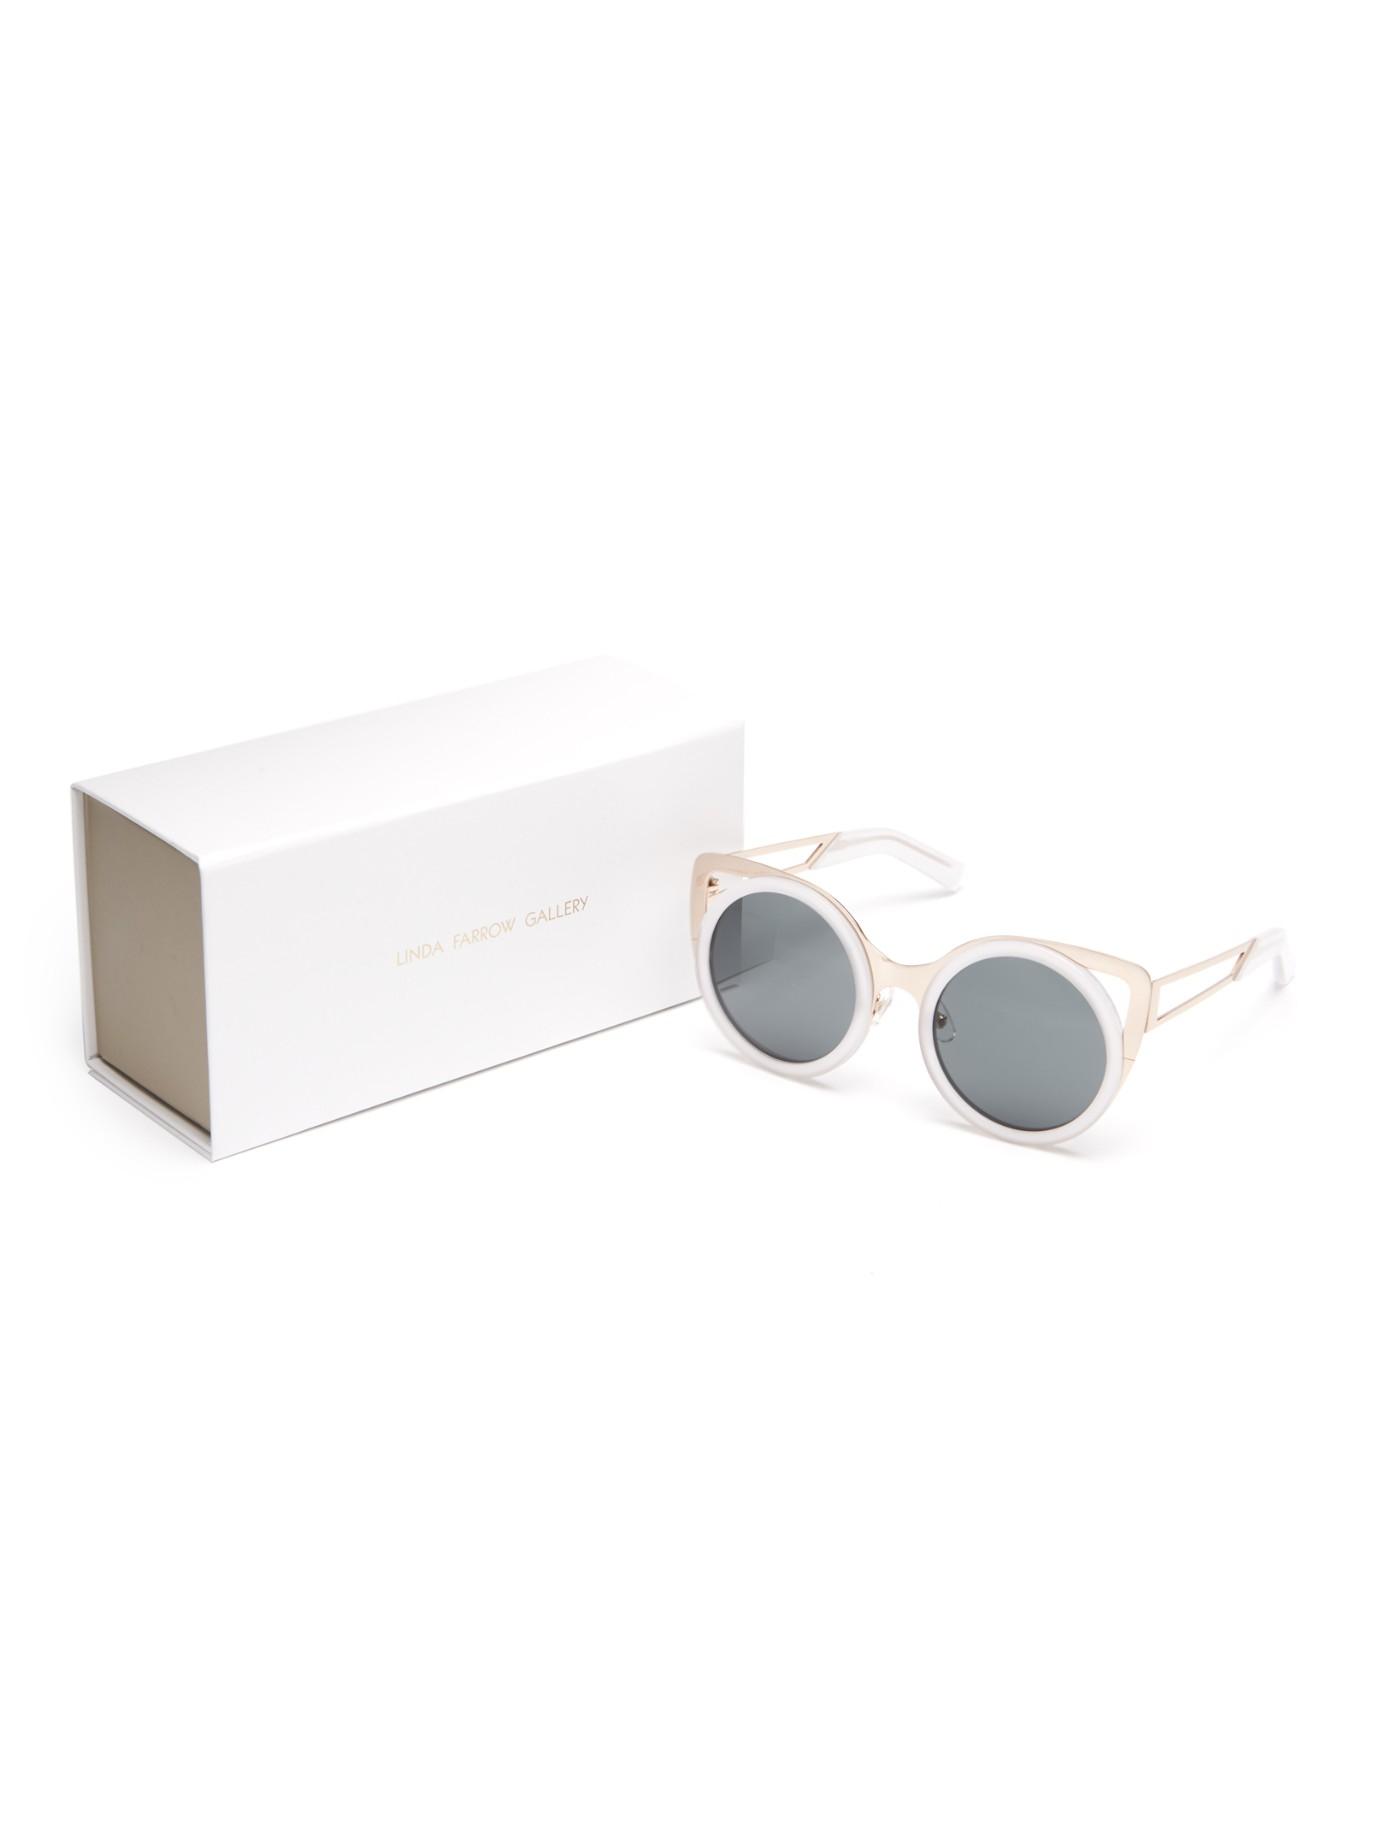 9ca5c2b37c6 Lyst - Erdem X Linda Farrow Cat-eye Sunglasses in White